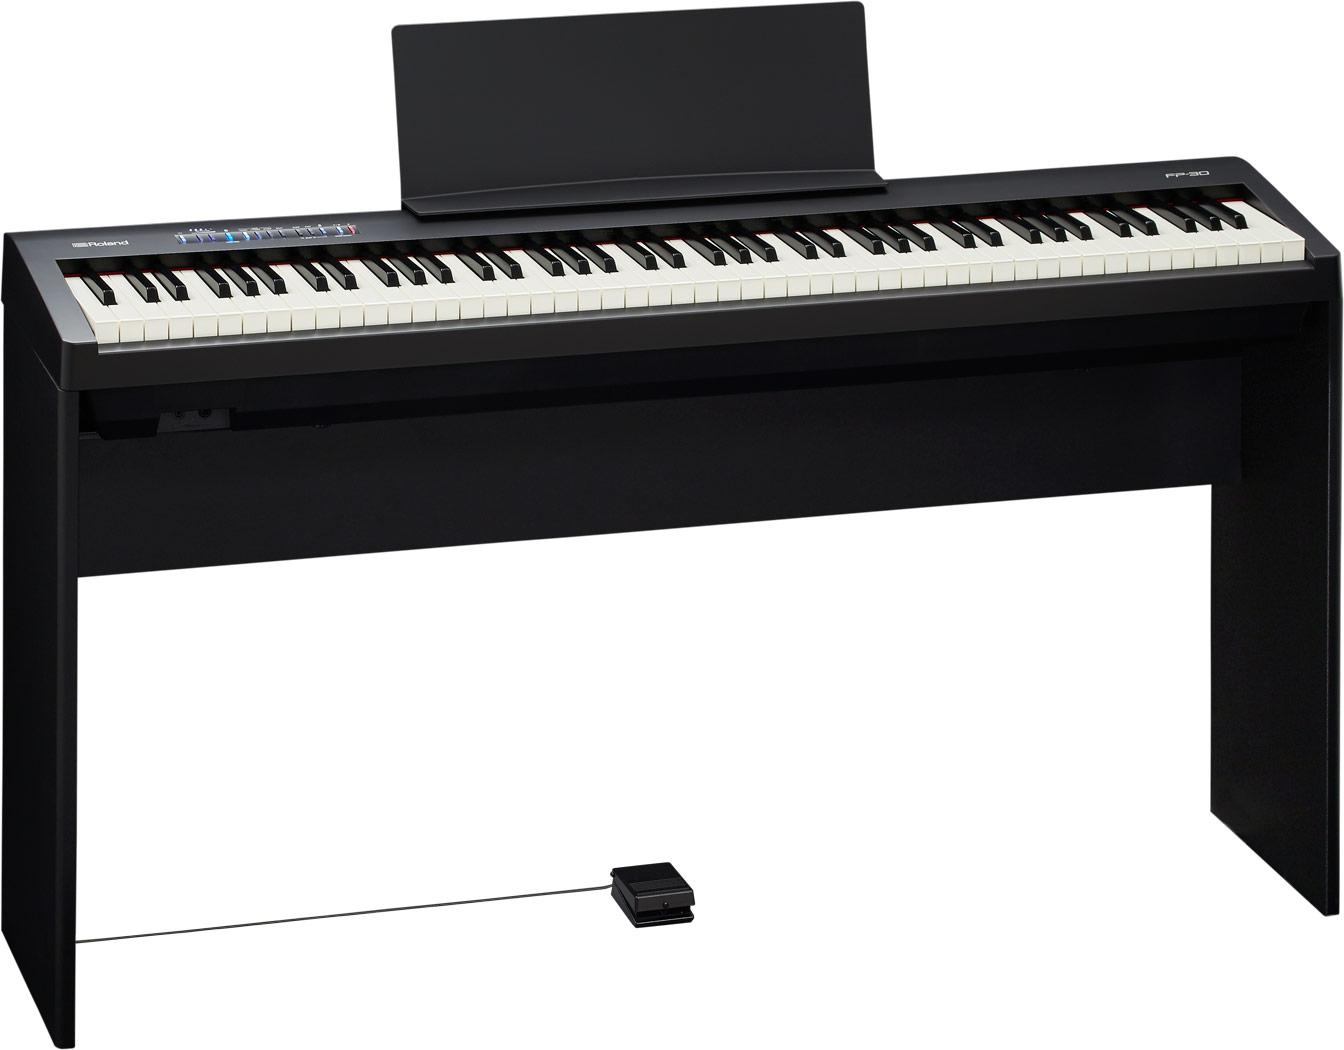 dan-piano-dien-roland-fp-30-gia-mem-cho-nha-chat-09